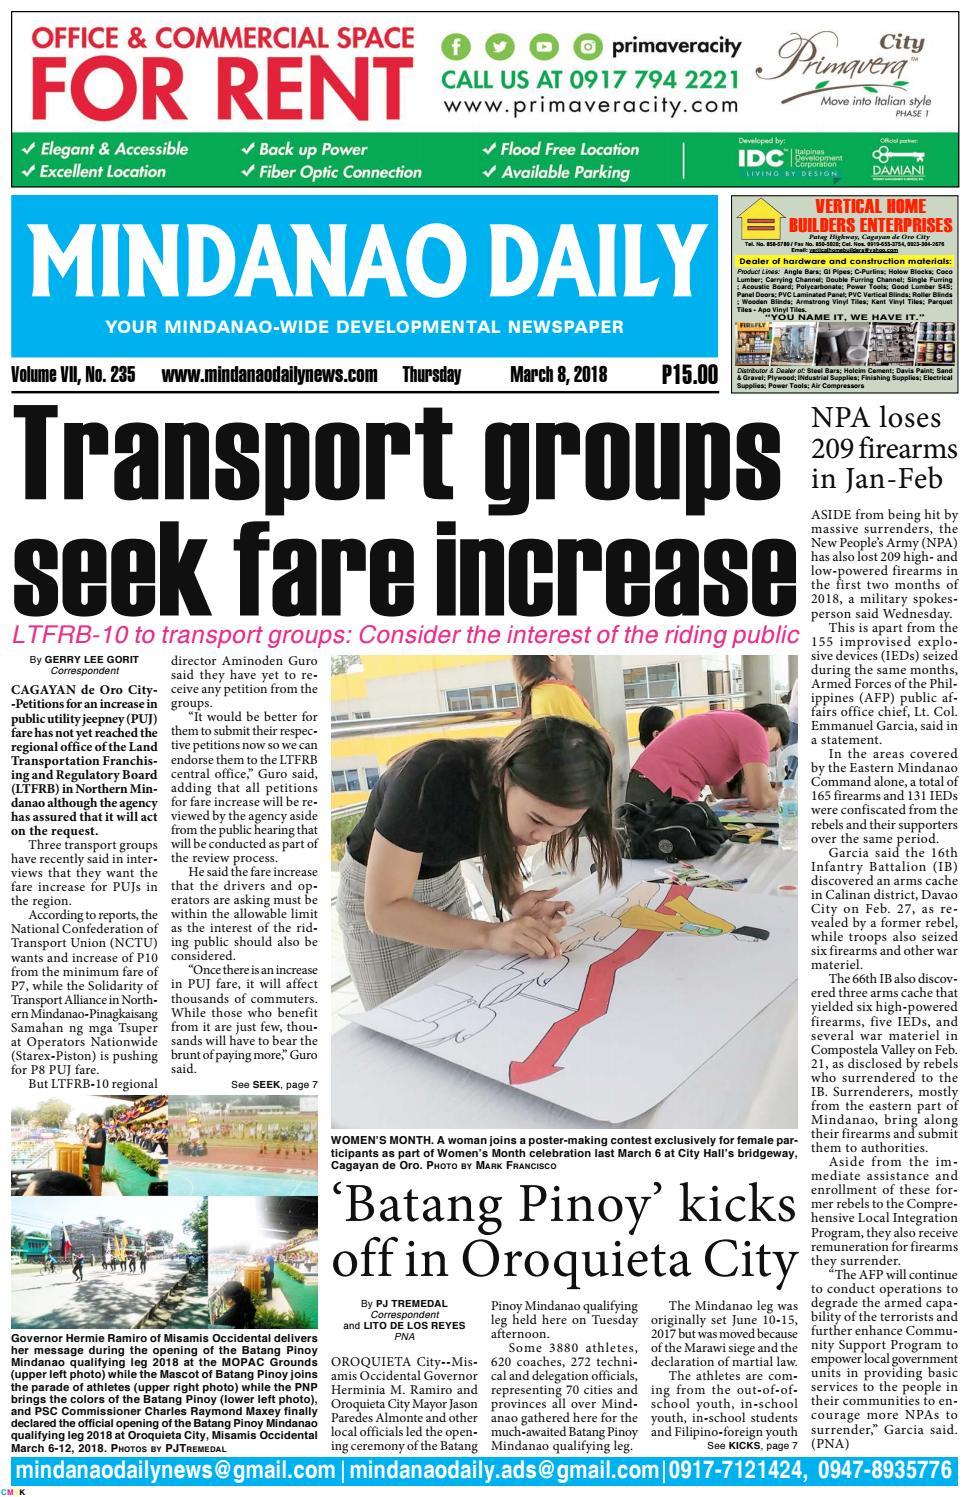 Mindanao Daily (March 8, 2018) by Mindanao Daily News - issuu